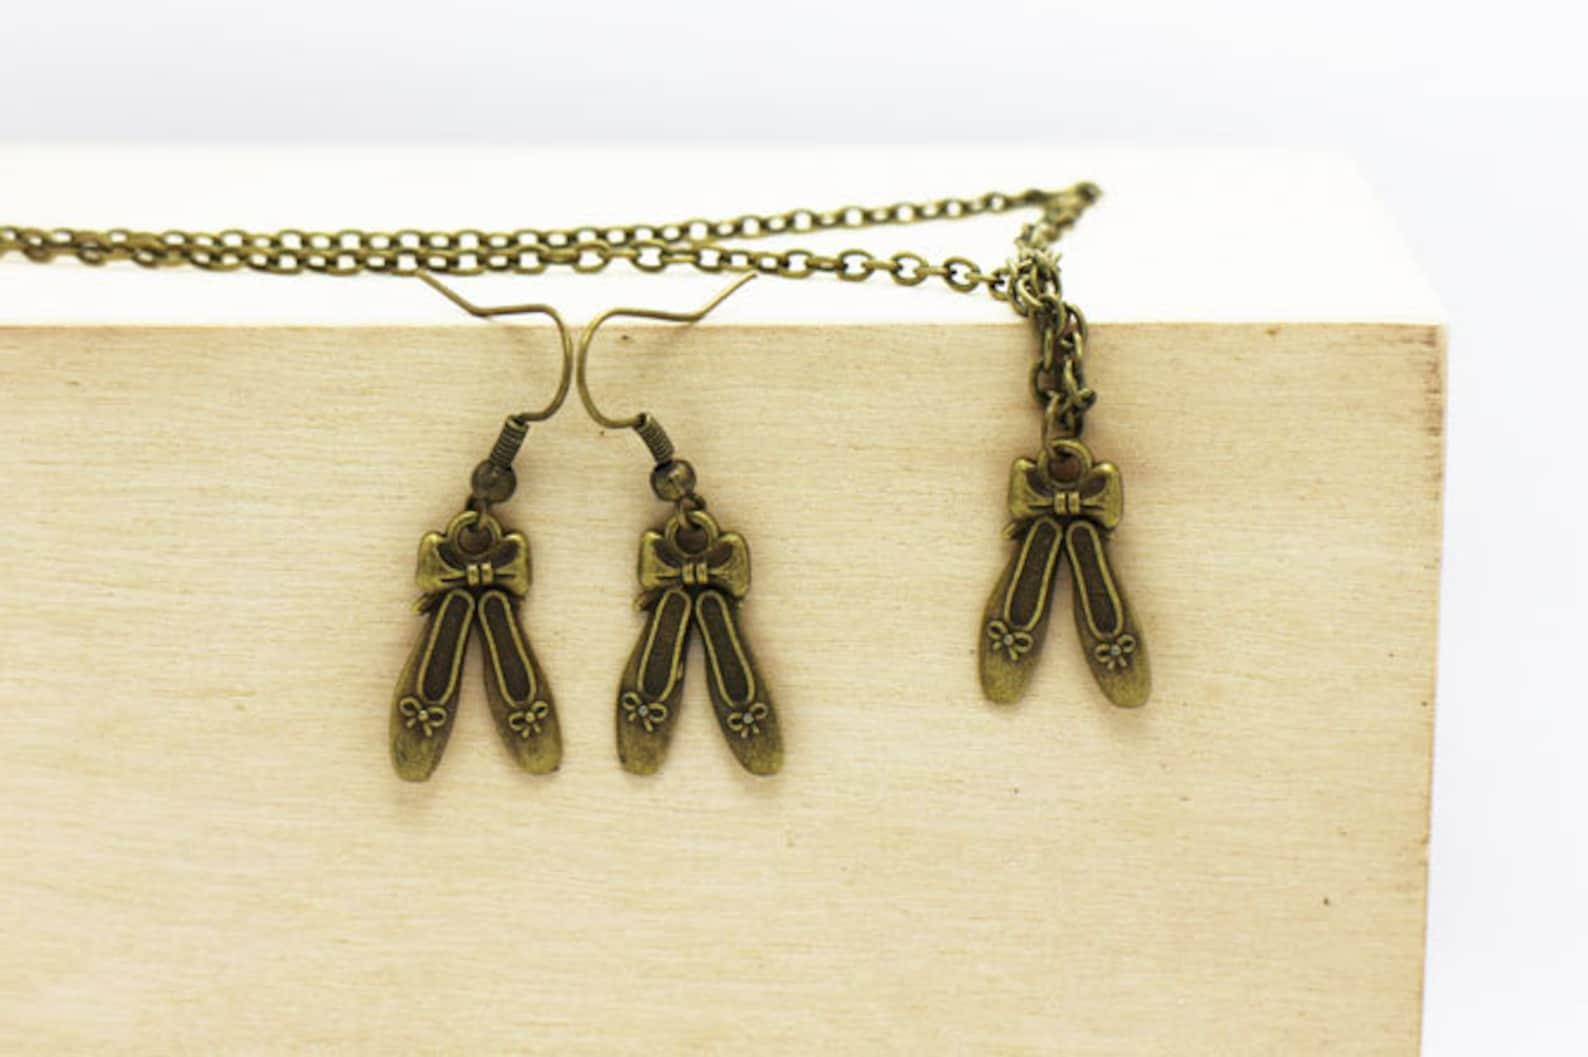 ballet slippers dangling earrings, ballet shoes necklace, antique bronze charm, jewelries set, vintage style, 3d charm, ballet,